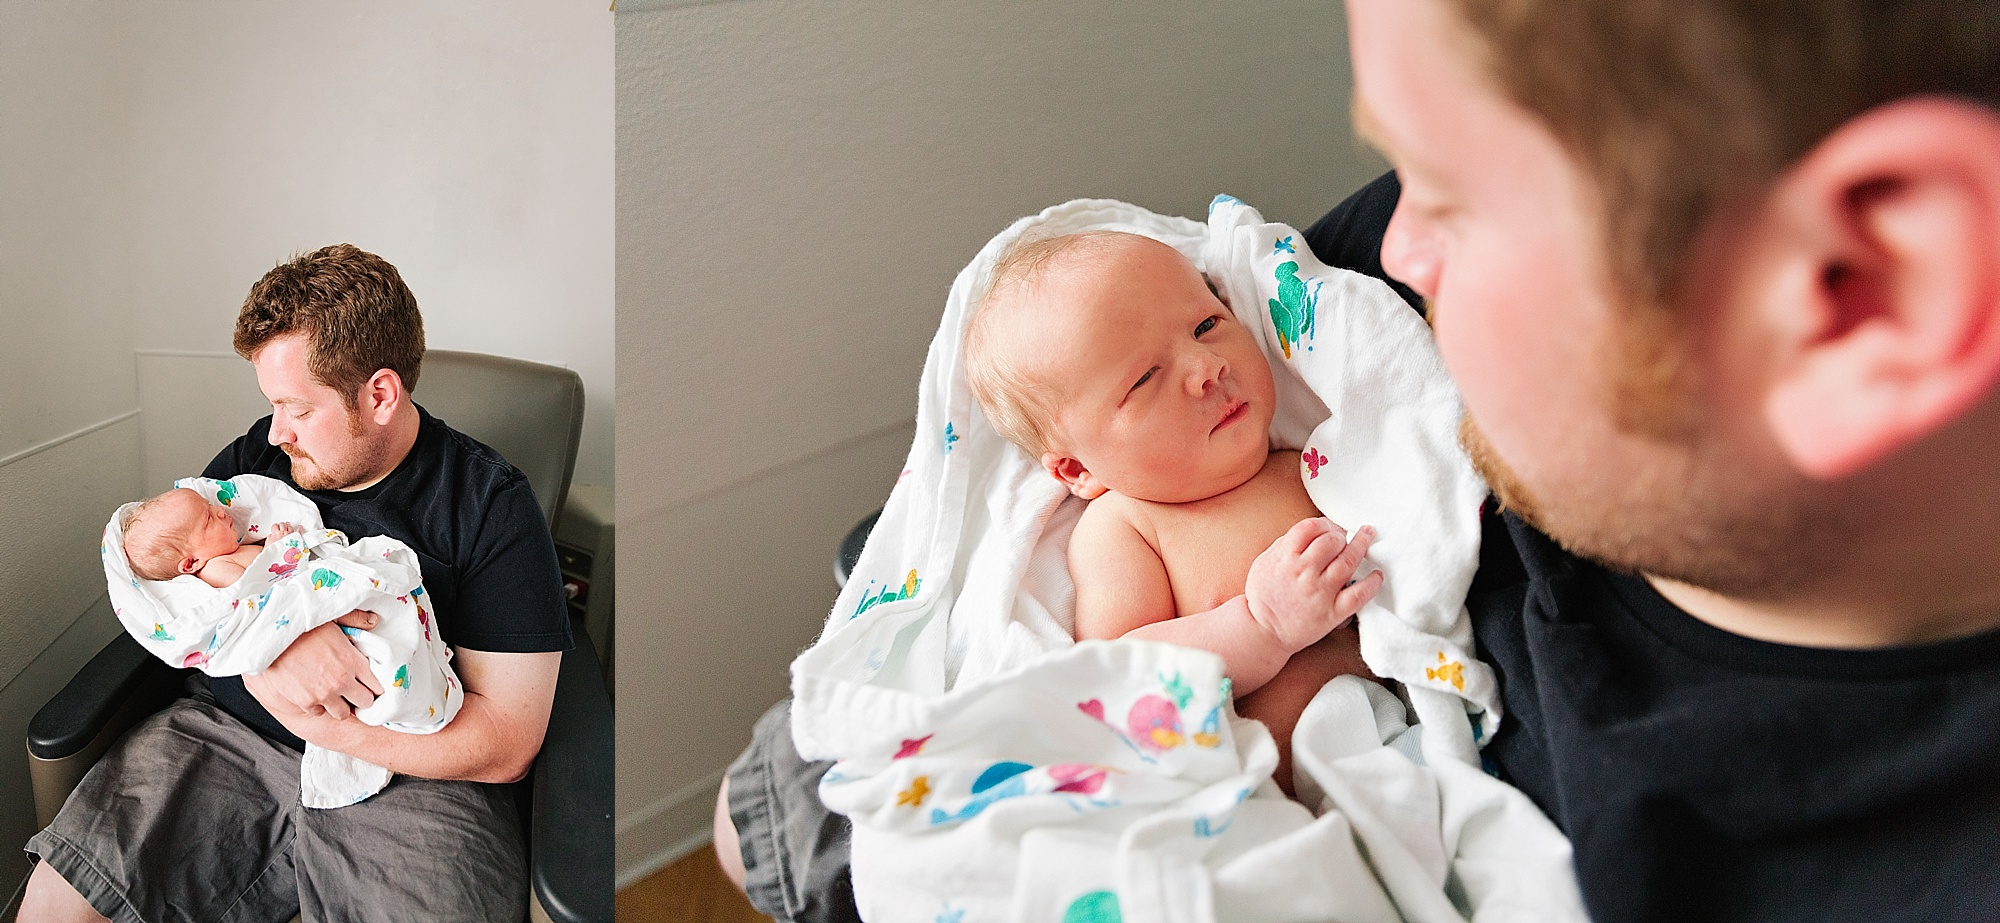 lauren-grayson-photography-akron-ohio-photographer-family-newborn-fresh-48-baby-hospital-photo-shoot-cleveland-clinic-akron-general-carter_0301.jpg